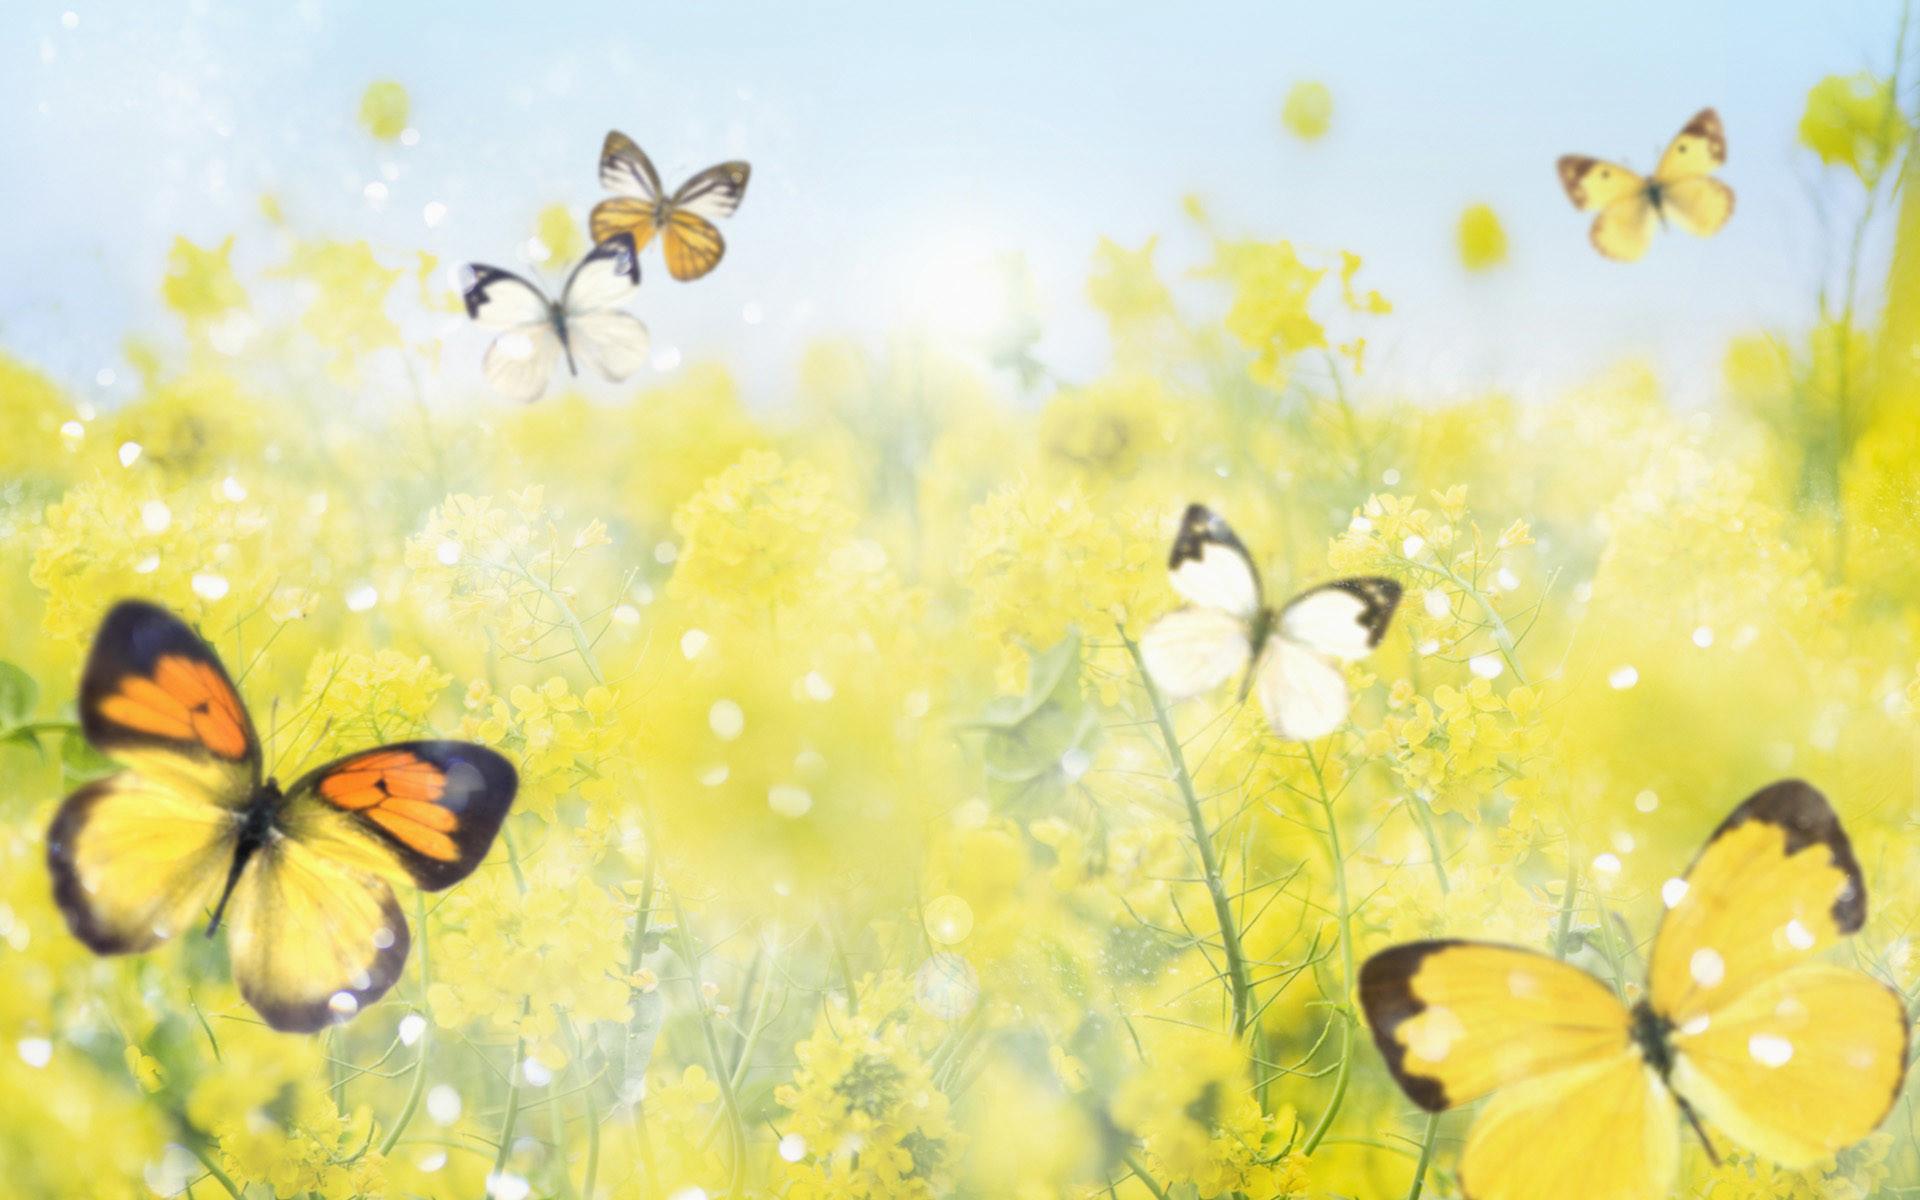 10 best Springtime images on Pinterest   Hd wallpaper, Flower wallpaper and  Nature wallpaper